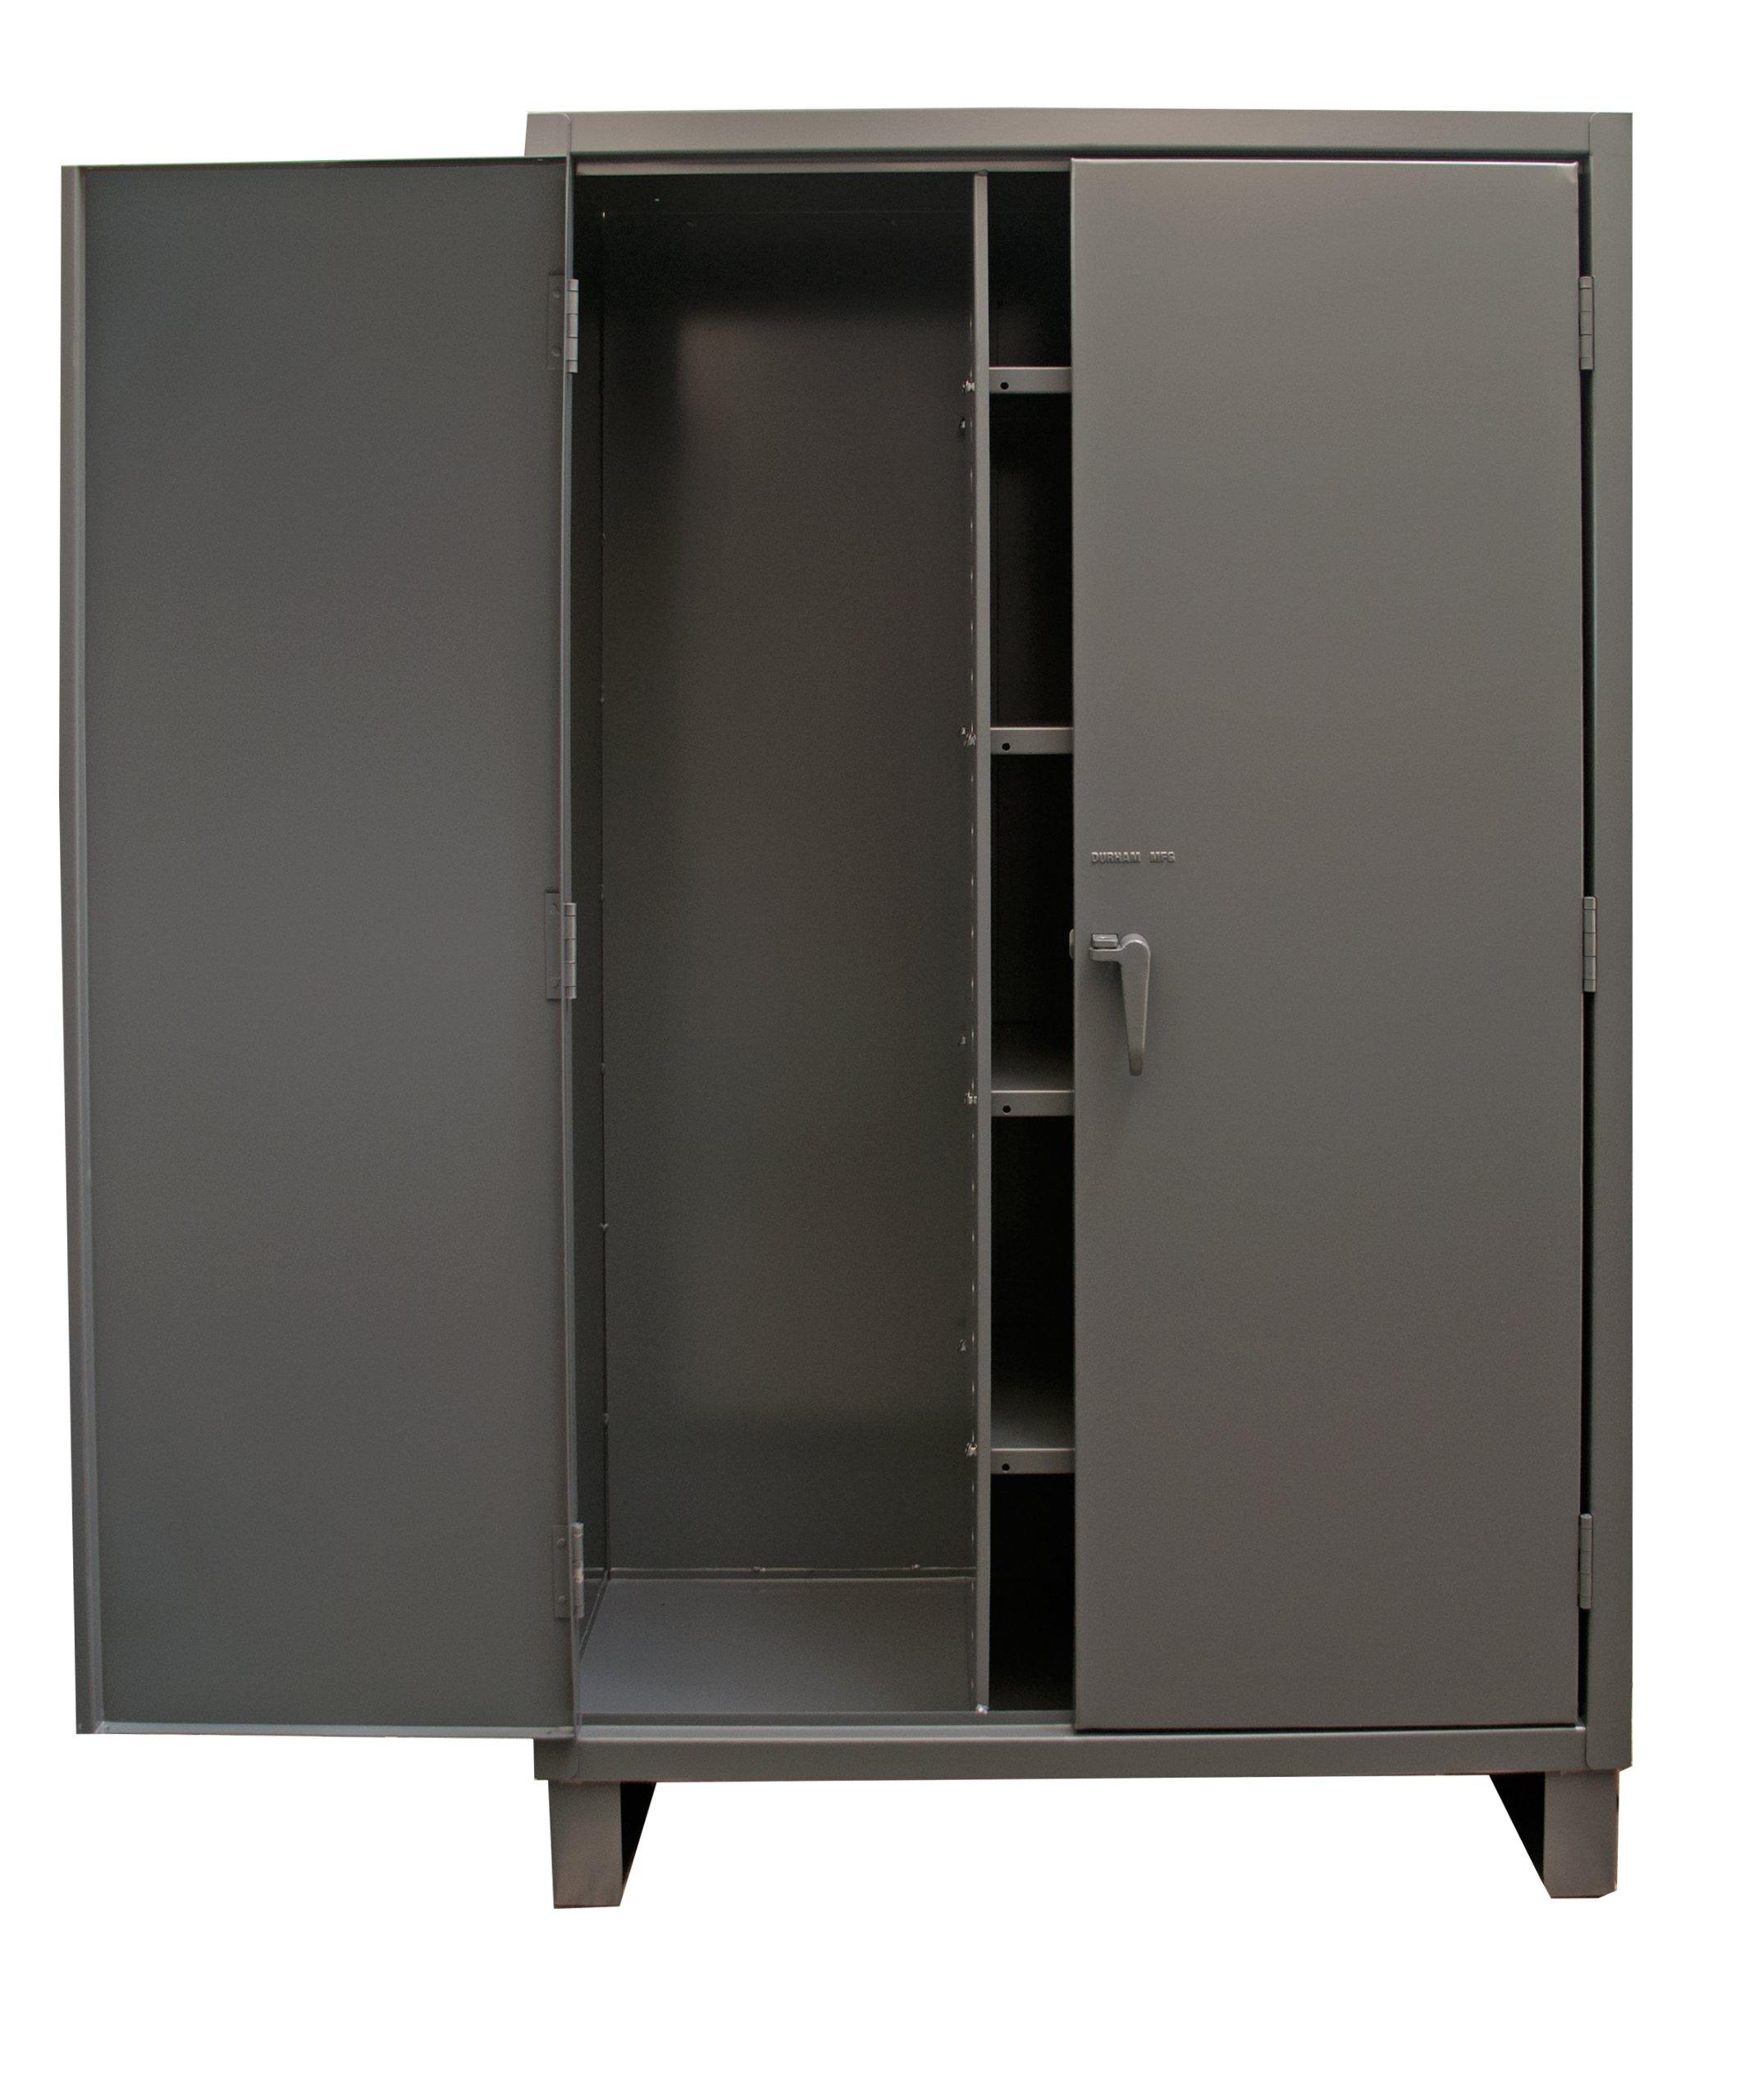 Durham Extra Heavy Duty Welded 12 Gauge Steel Lockable Maintenance Cabinet, HDJC244878-4S95, 1375 lbs Shelf Capacity, 24'' Length x 48'' Width x 78'' Height, 4 Shelves